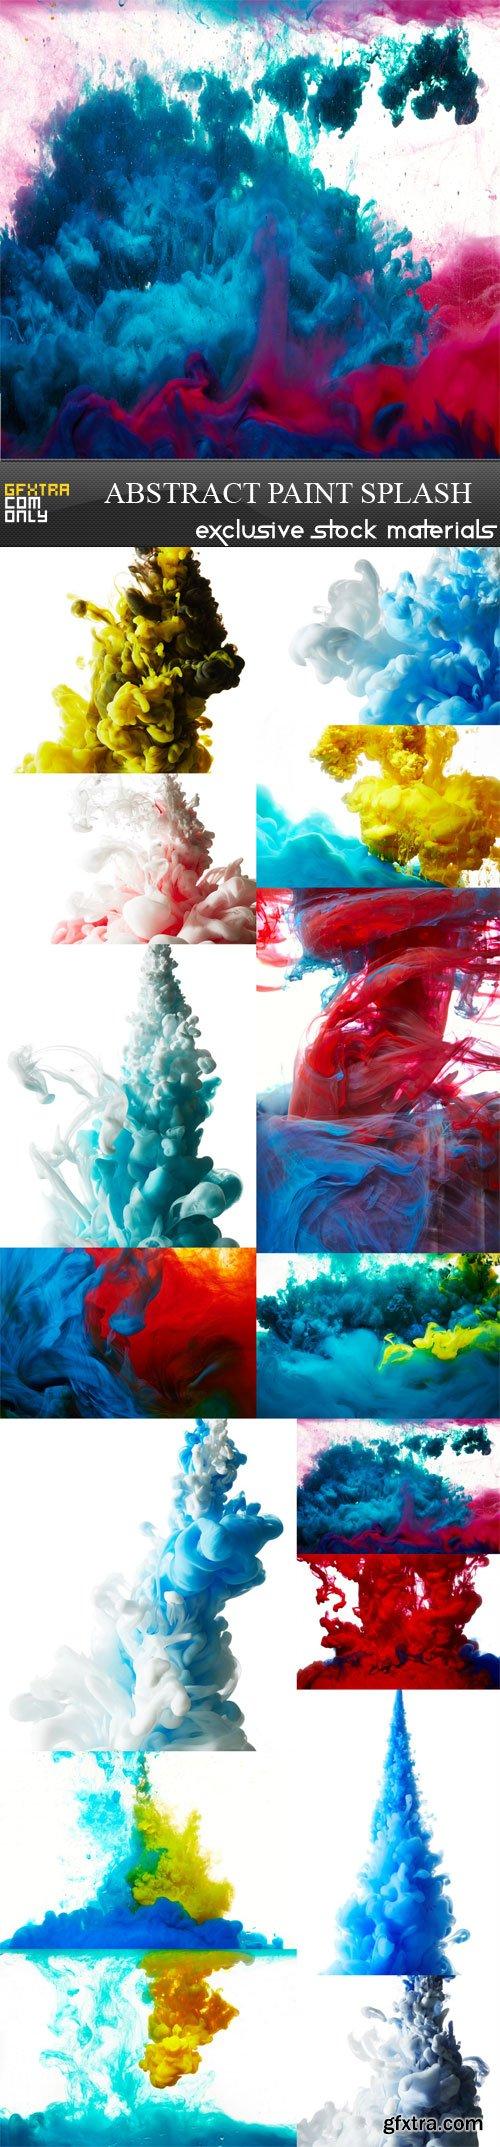 Abstract paint splash, 15 UHQ JPEG